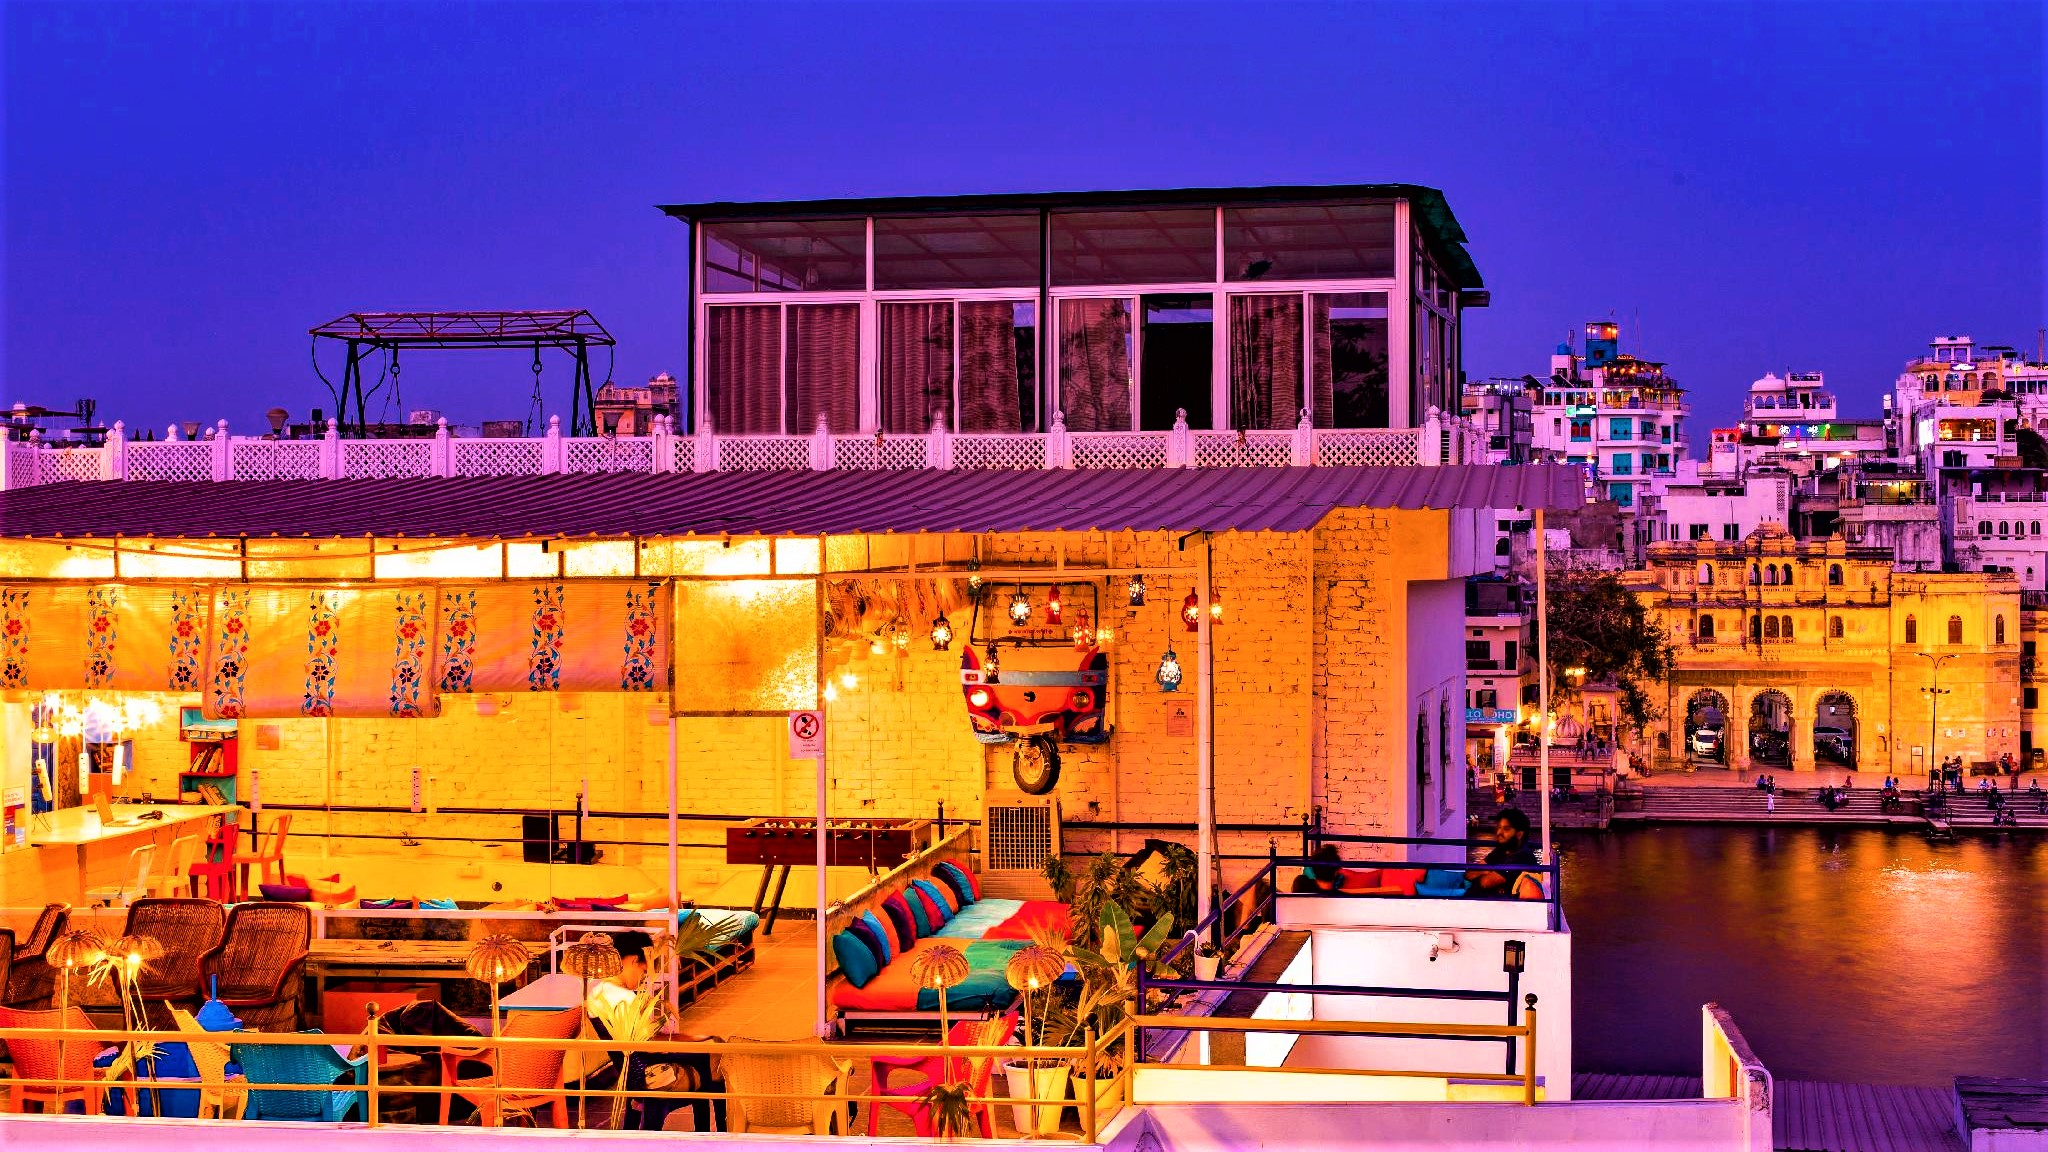 GoStops Udaipur – 3 Star Hotel in Udaipur – Stops Hostel Udaipur